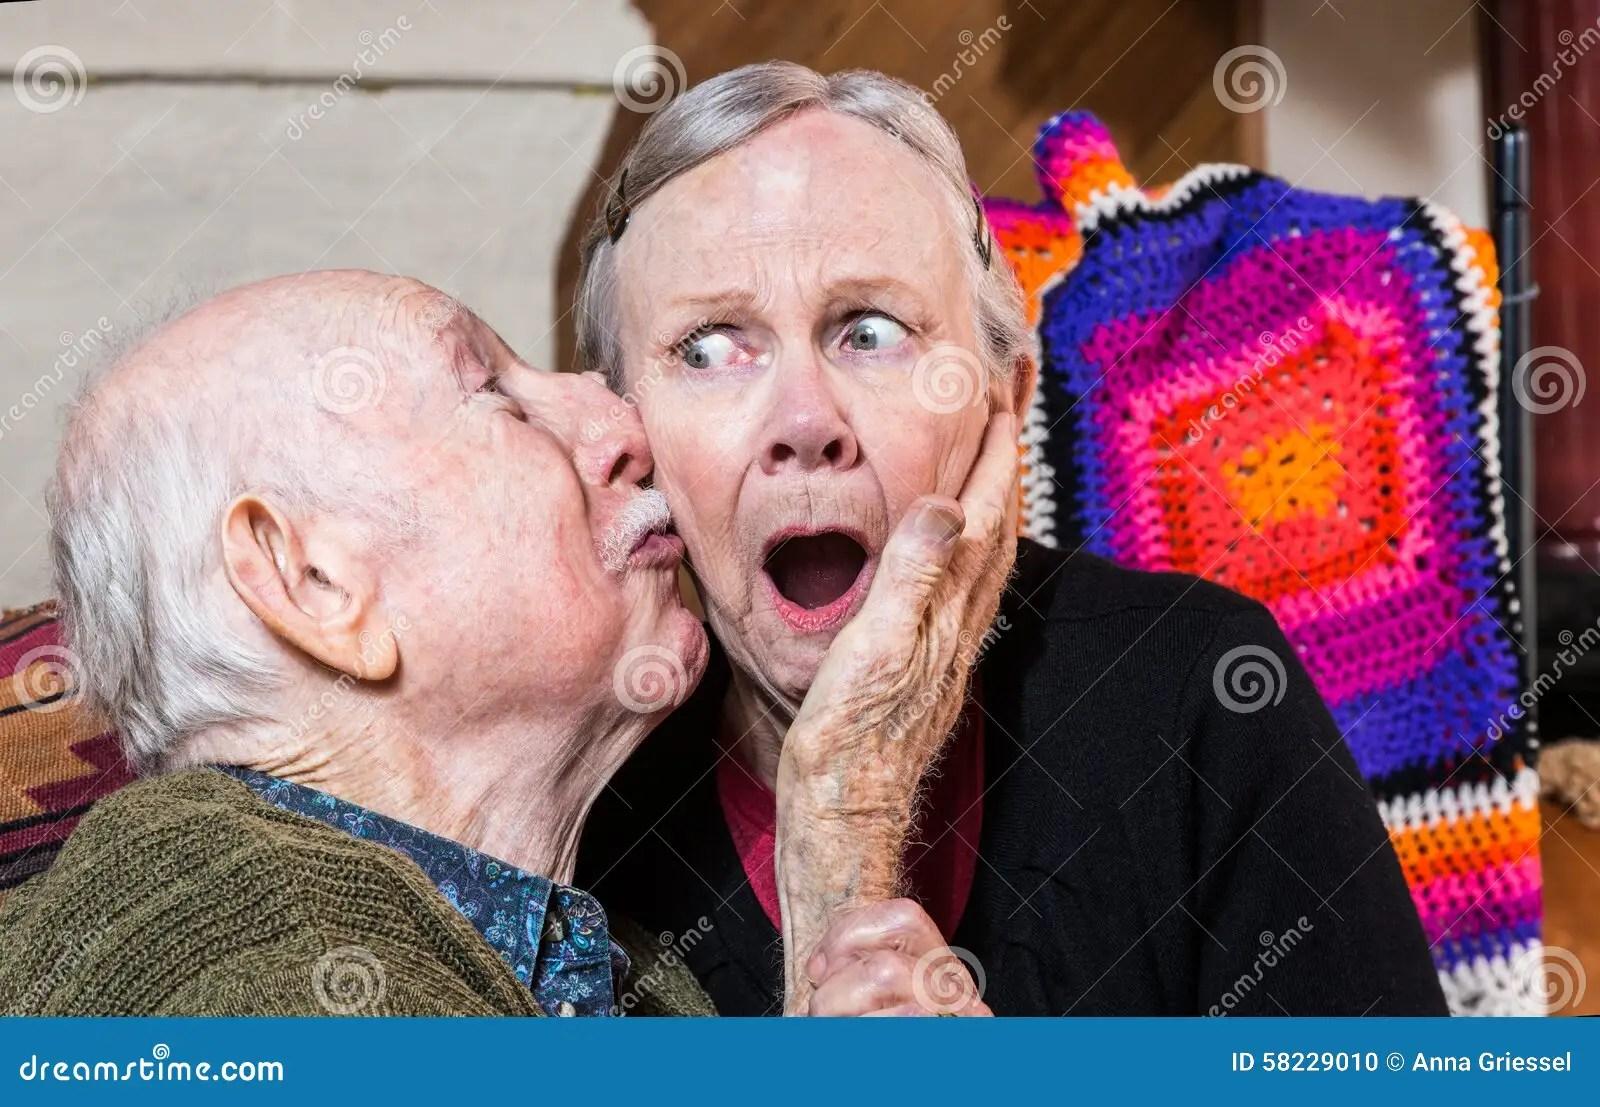 Older Gentleman Kissing Older Woman On Cheek Stock Photo